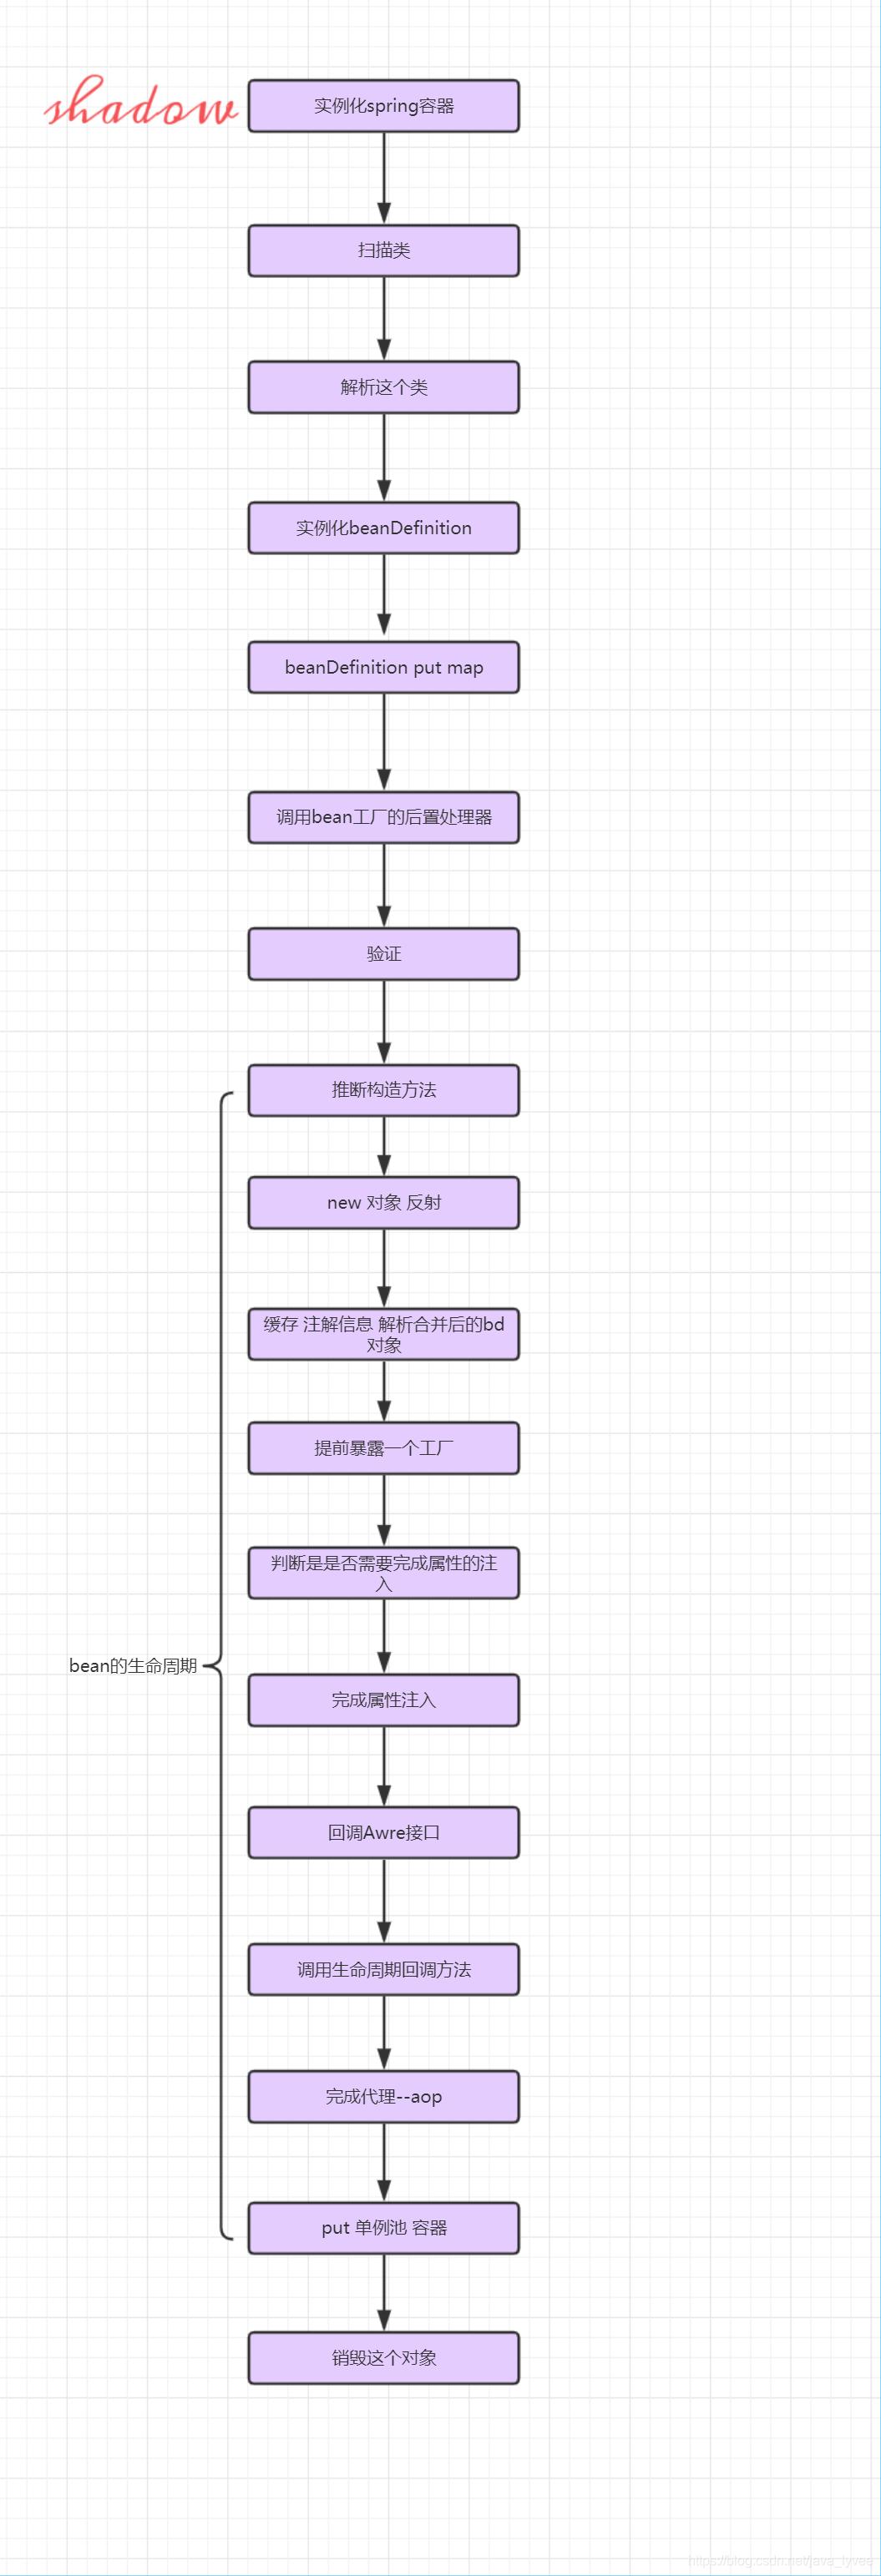 https://img-blog.csdnimg.cn/20191118210559319.png?x-oss-process=image/watermark,type_ZmFuZ3poZW5naGVpdGk,shadow_10,text_aHR0cHM6Ly9ibG9nLmNzZG4ubmV0L2phdmFfbHl2ZWU=,size_16,color_FFFFFF,t_70